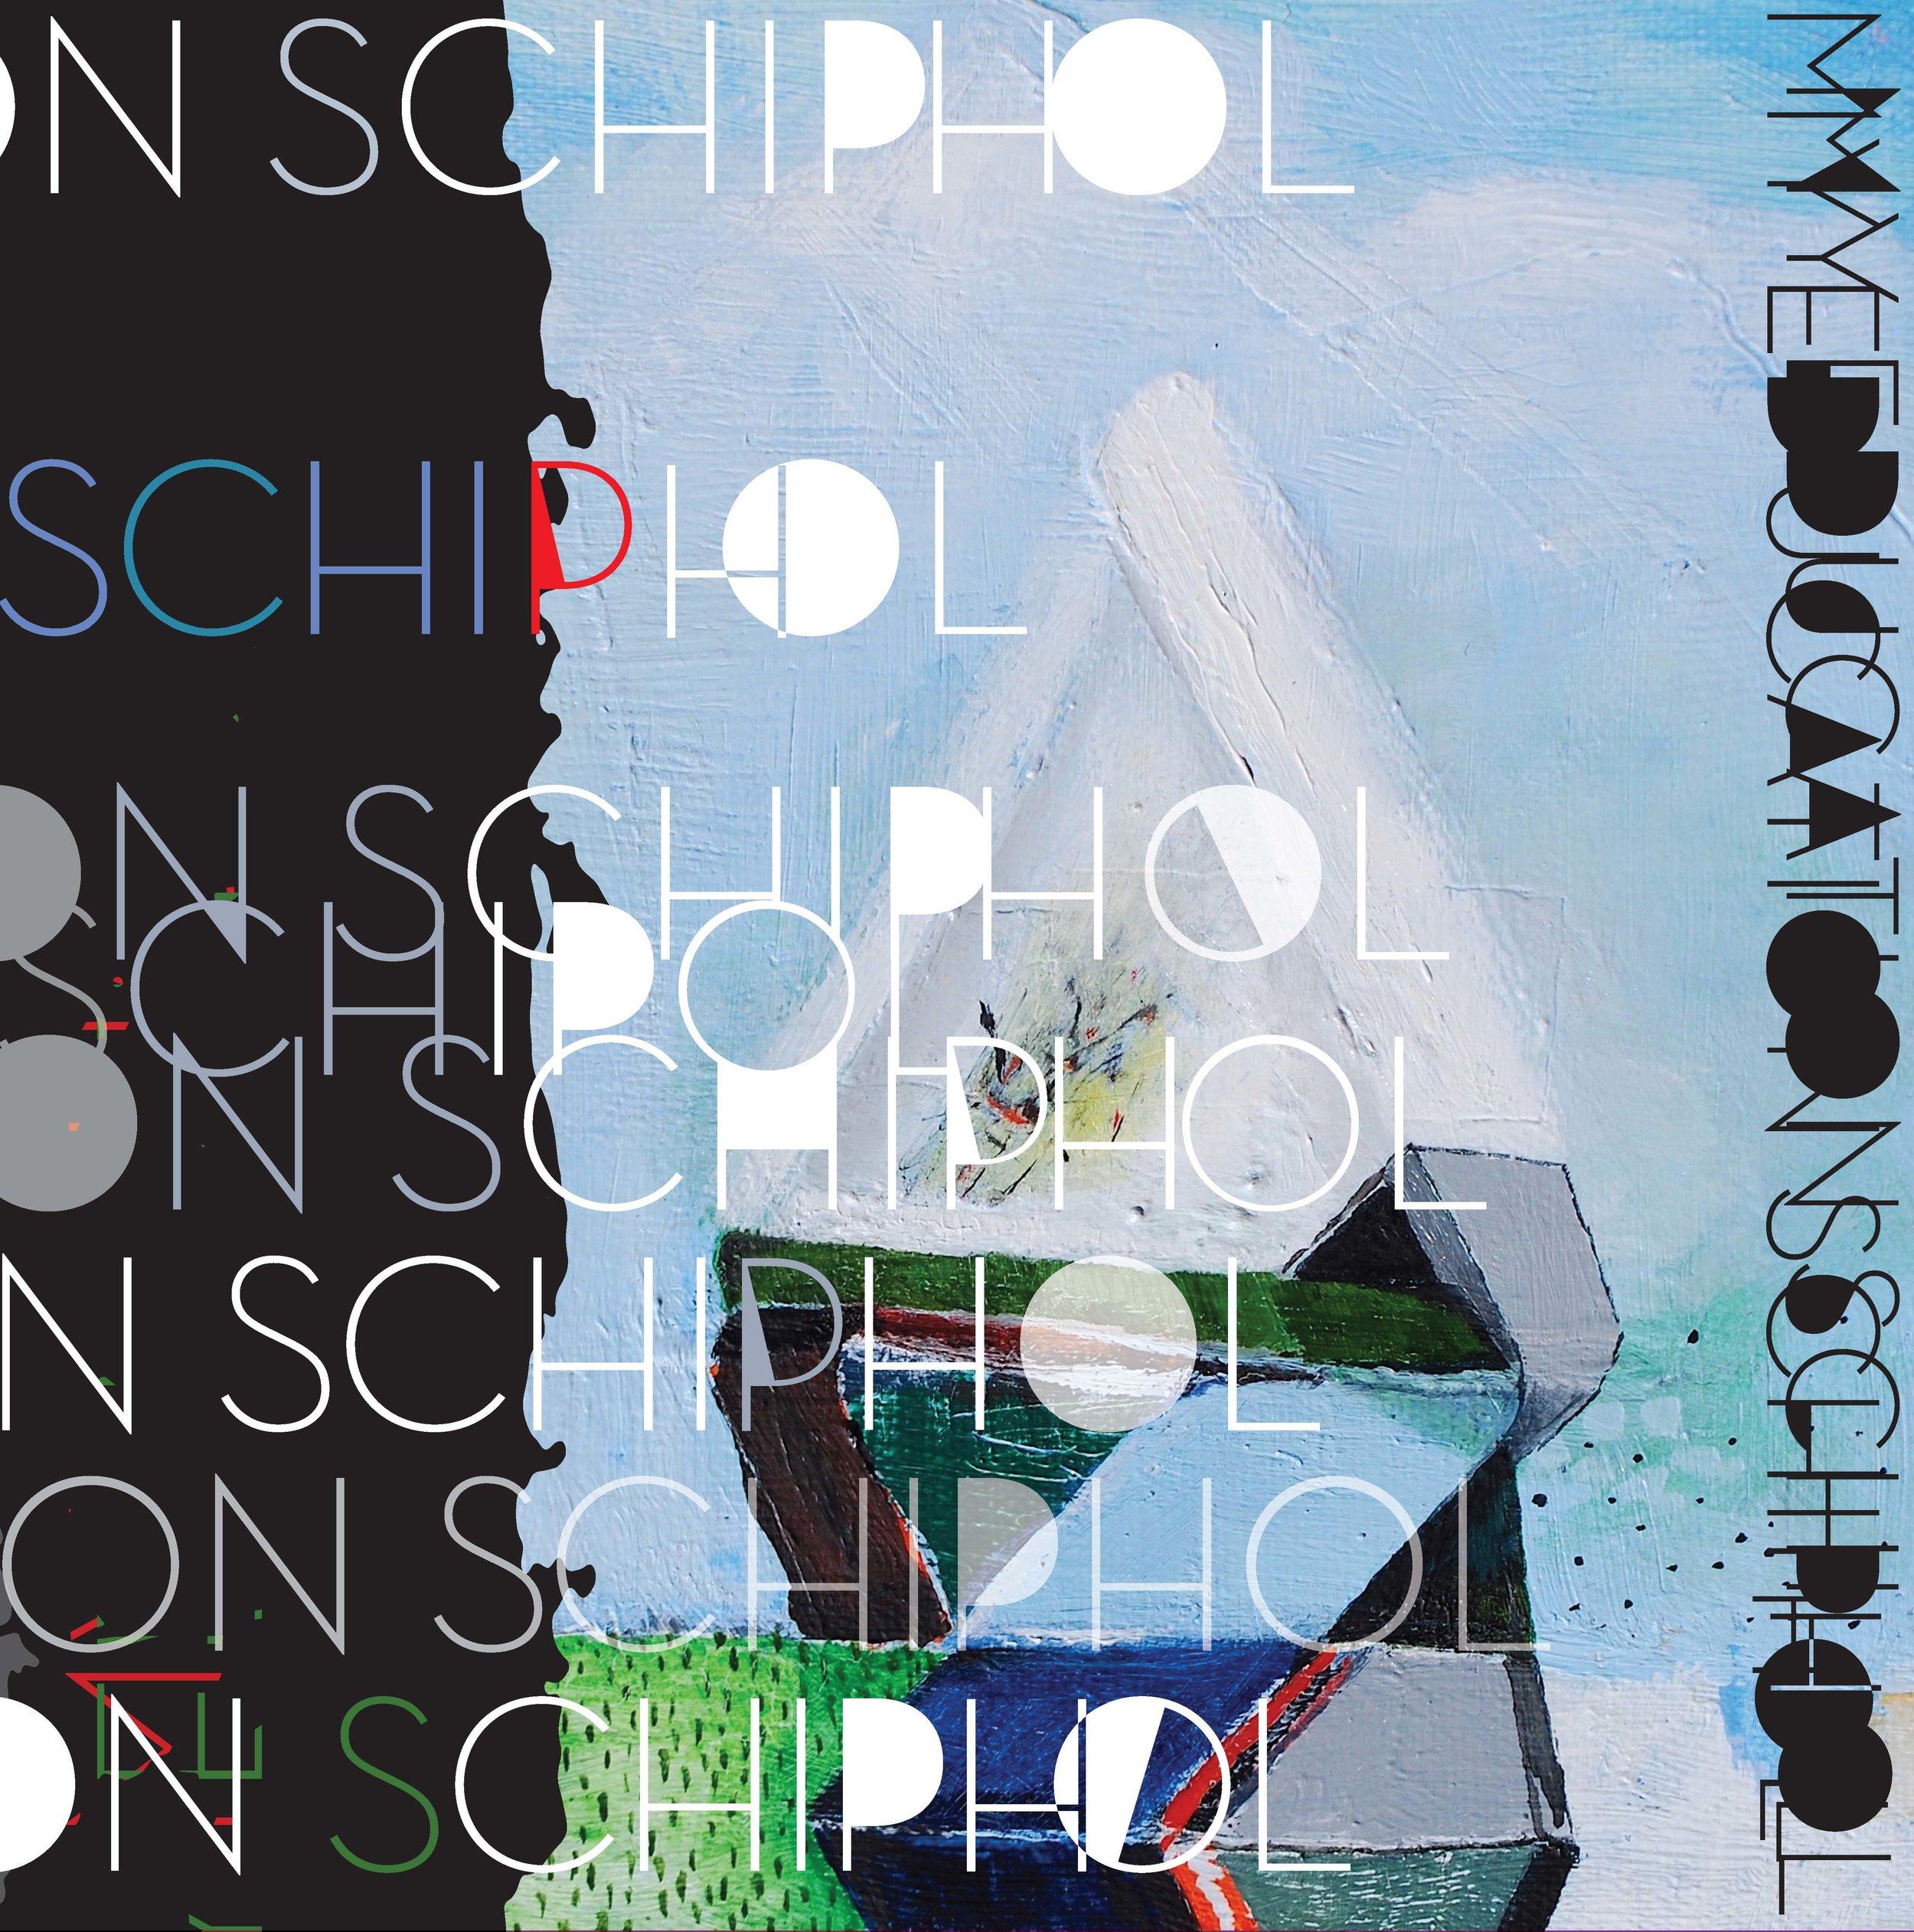 my education - schiphol